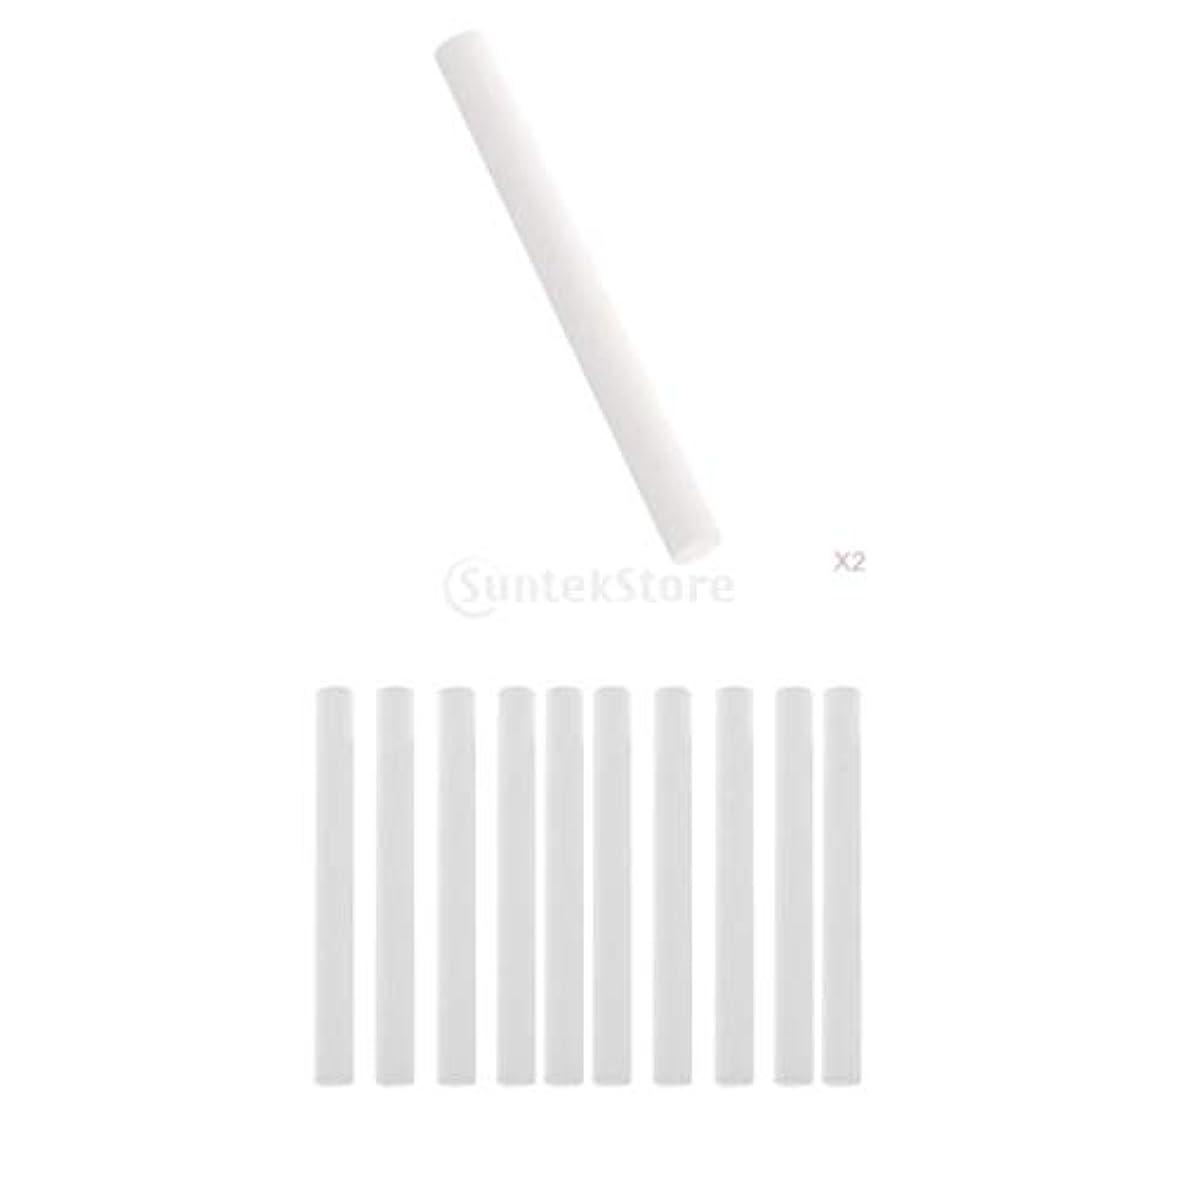 Shiwaki アロマスティック 芳香剤詰替用スティック アロマディフューザー用 スポンジ 11個入り